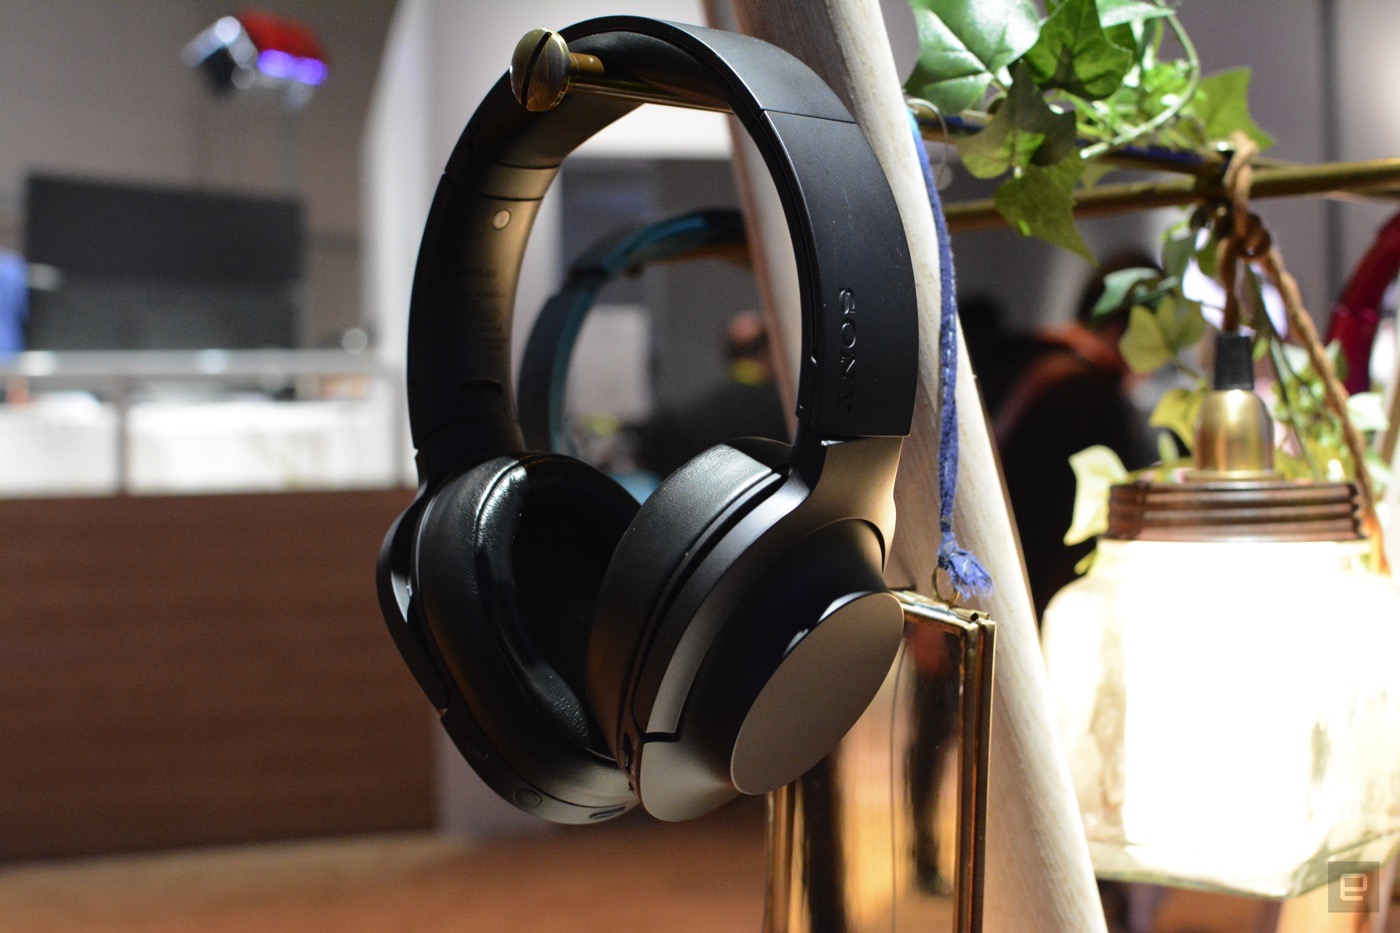 Sony's new wireless headphones mix comfort and great audio